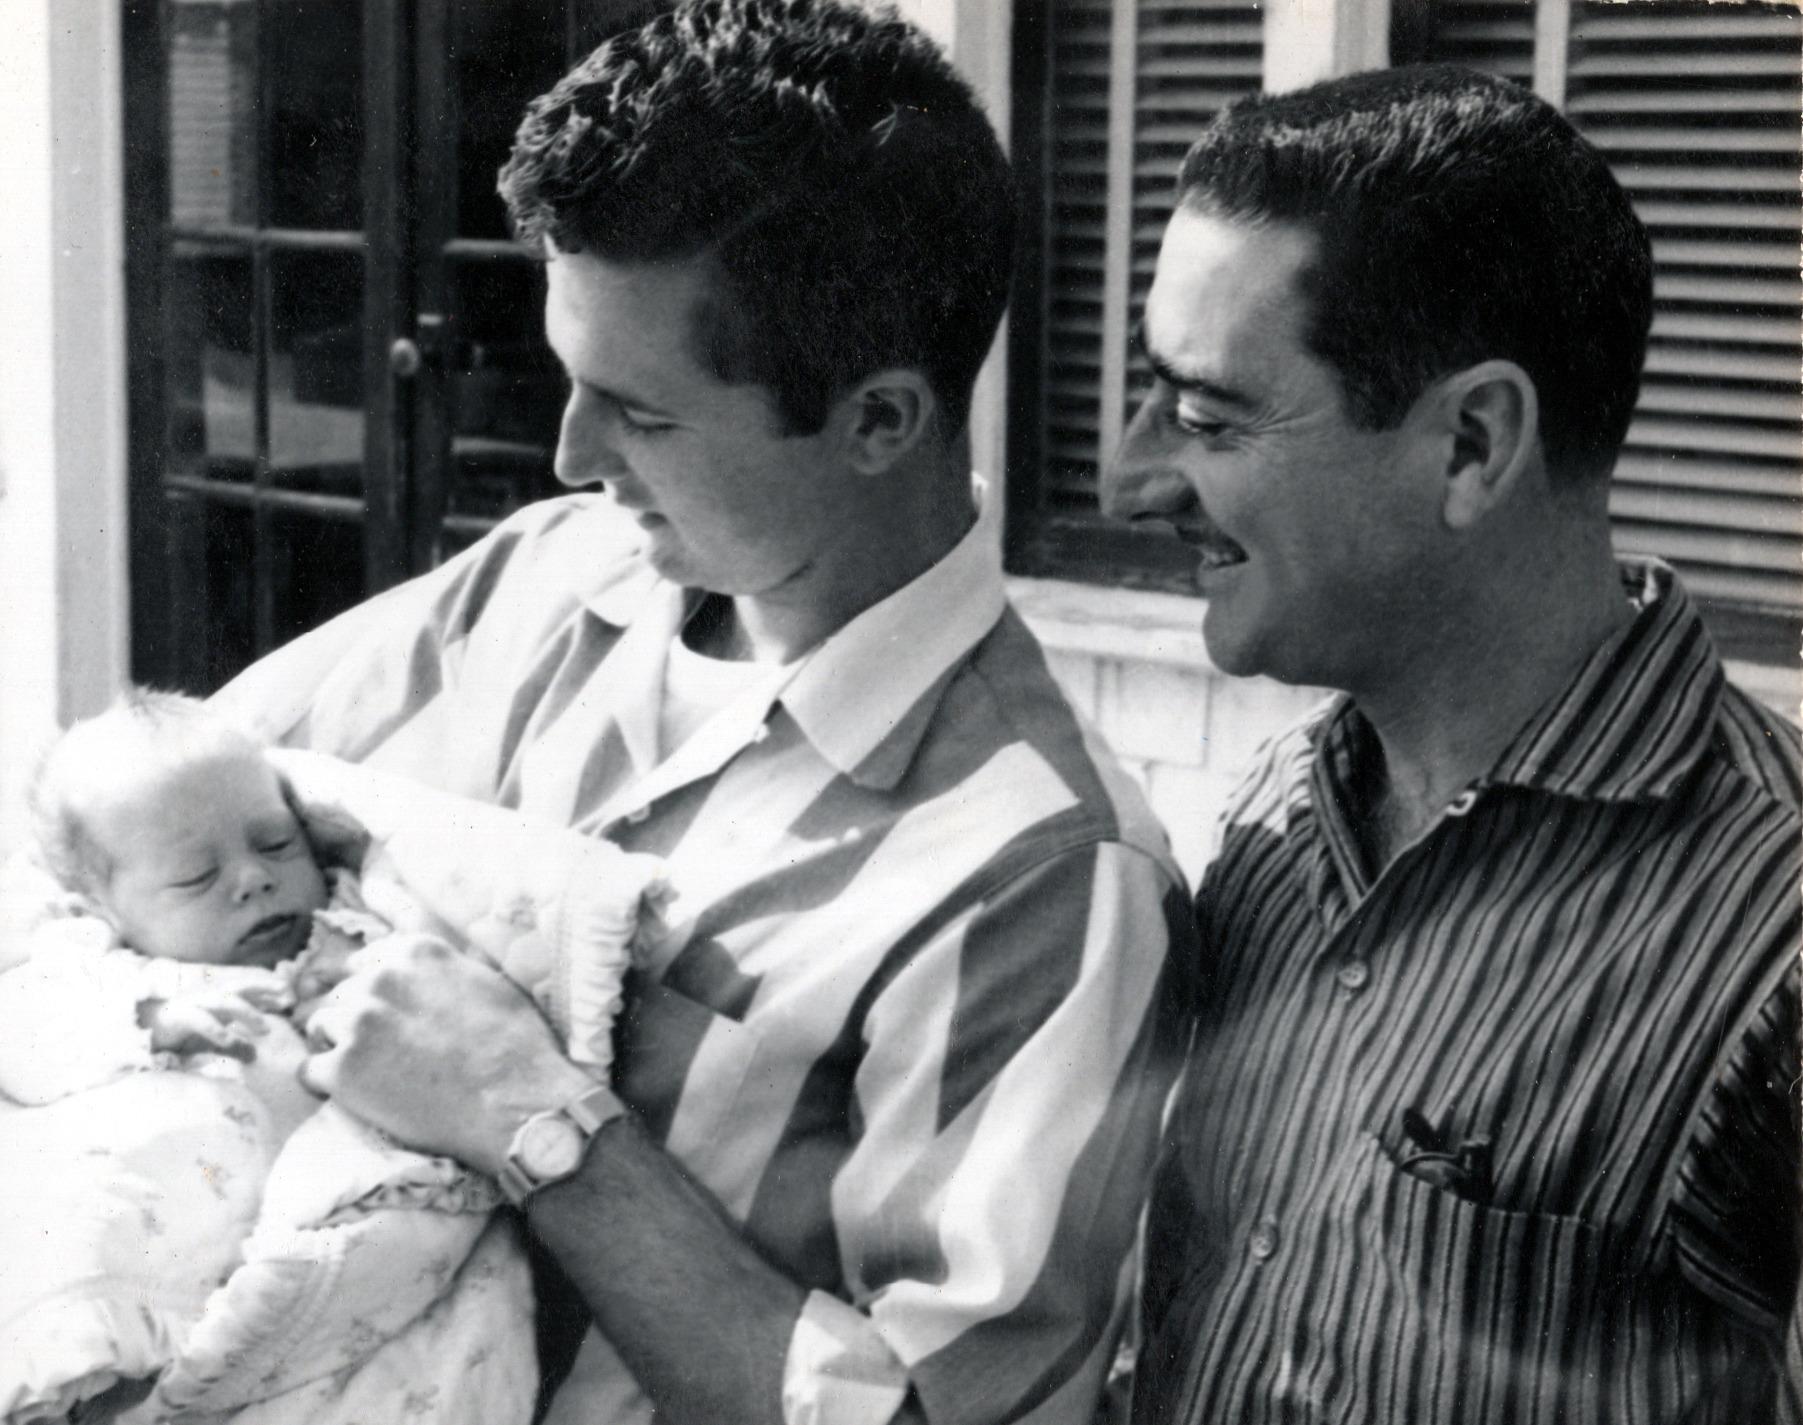 Buddy, Dad & Grandpa